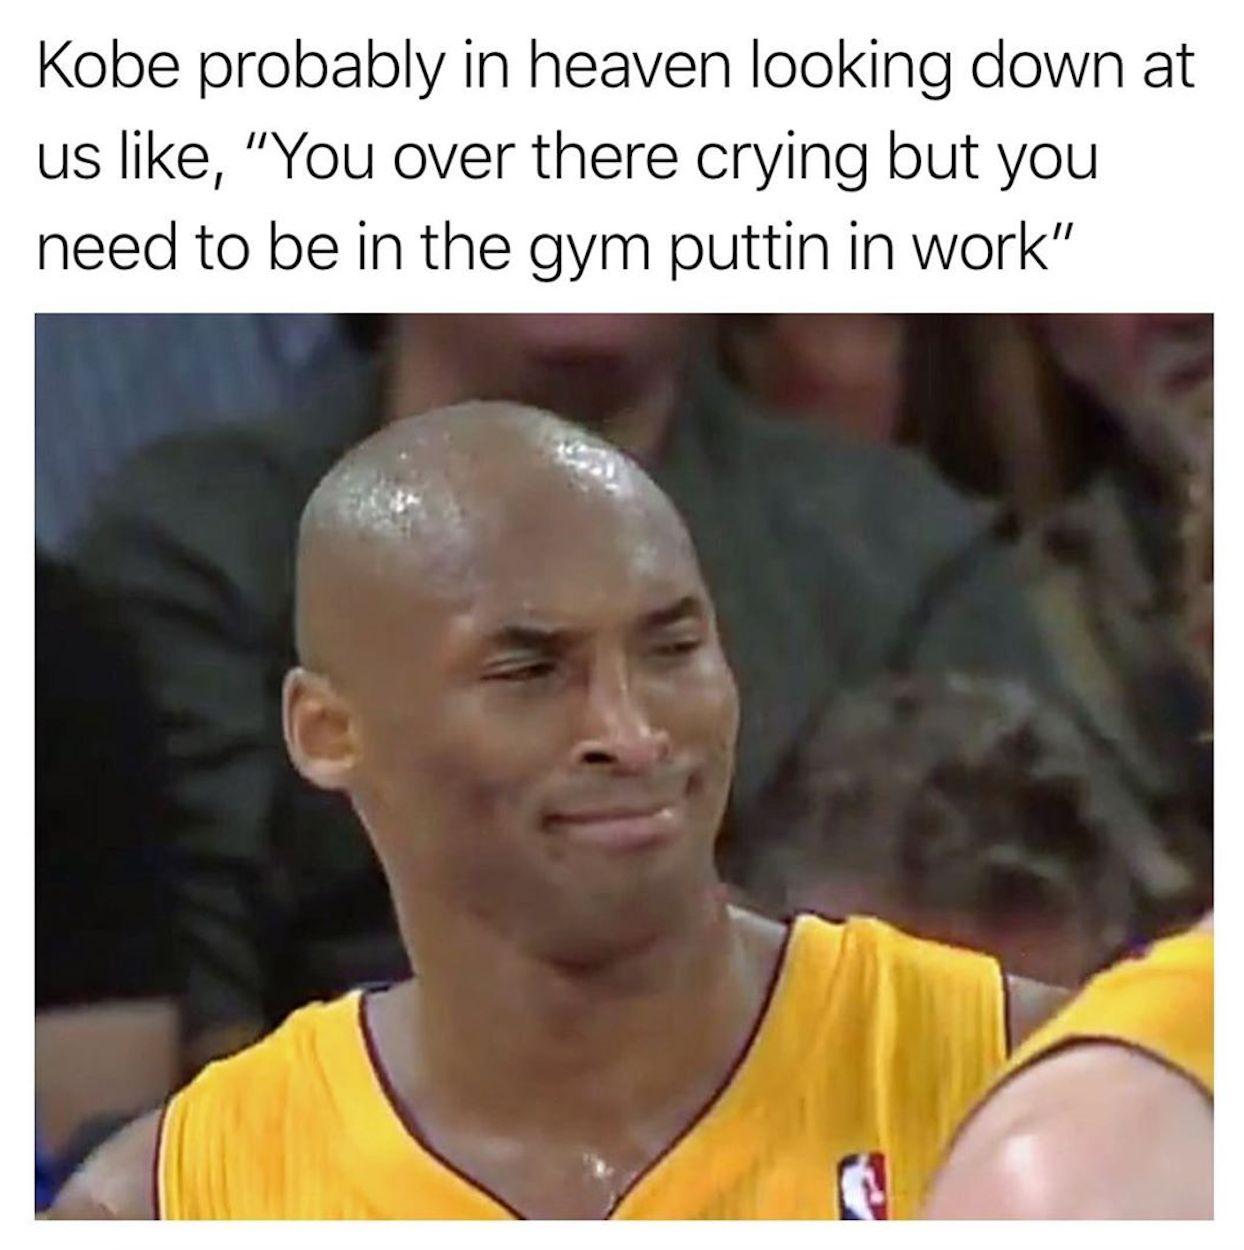 Mario Lopez Faces Backlash Over Kobe Bryant Meme Too Soon